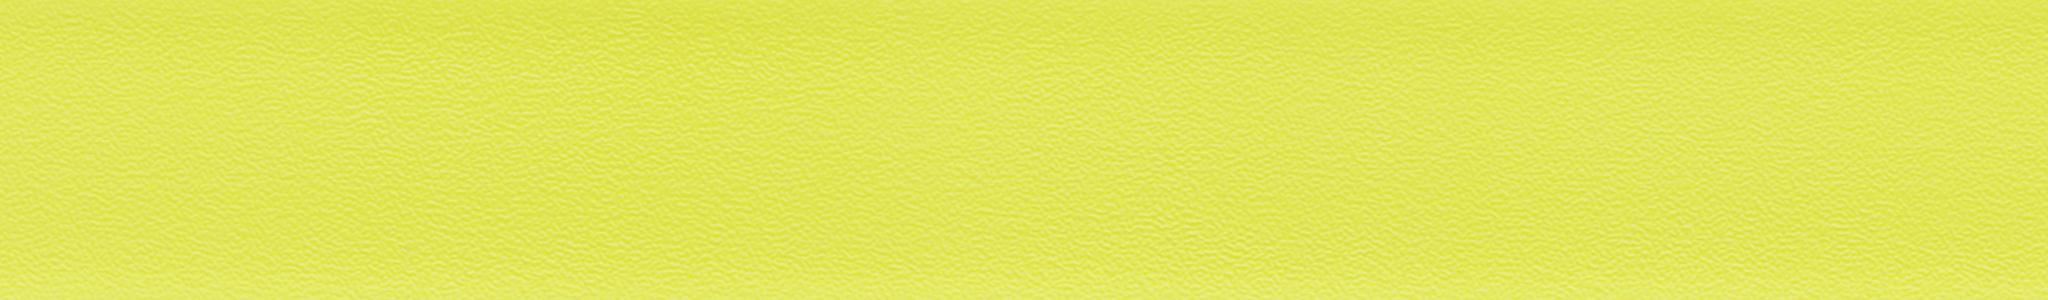 HU 161856 ABS hrana zelená perla 101